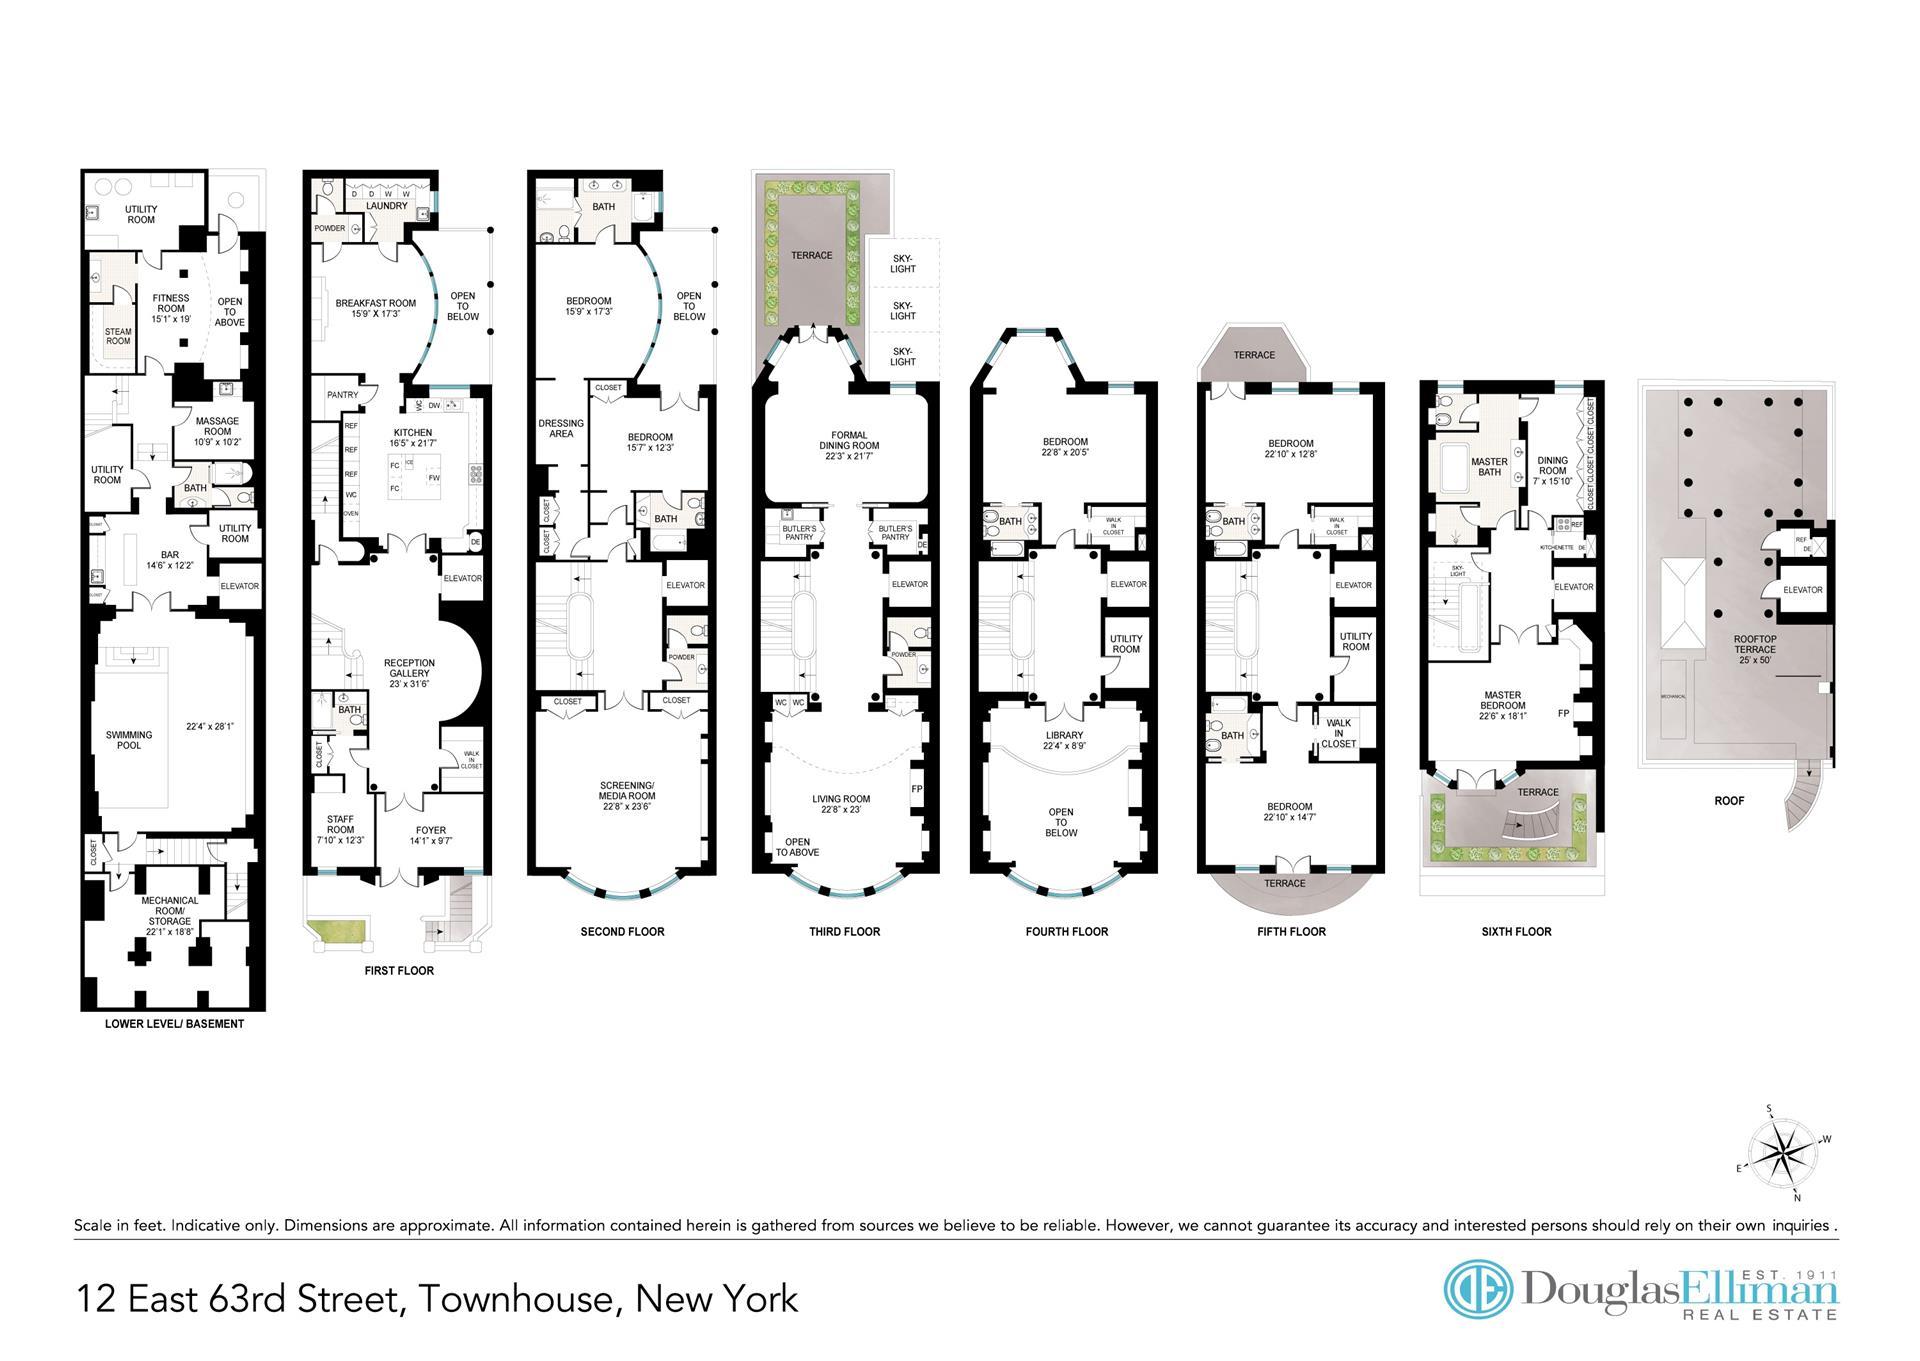 Floor plan of 12 East 63rd Street - Upper East Side, New York